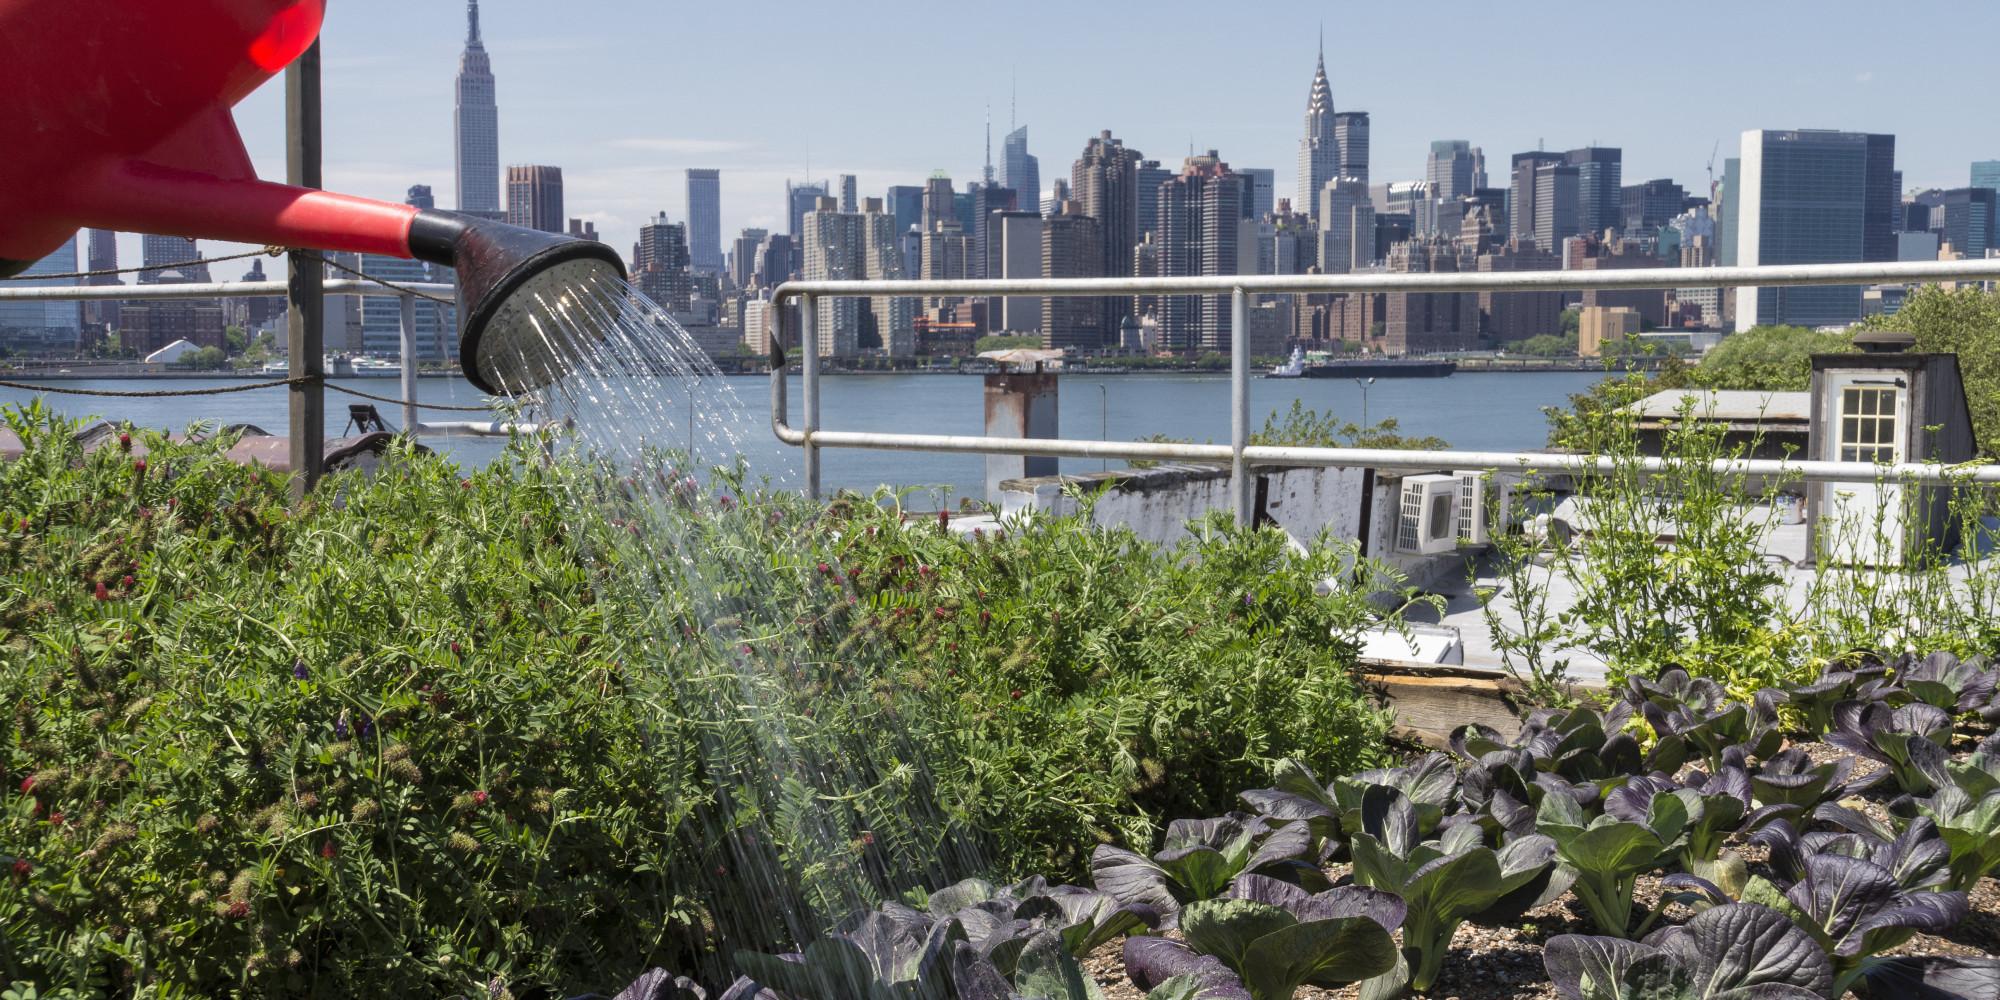 Urban Gardening: It Donu0027t Mean A Thing If It Ainu0027t Organic   Lifestylemanor